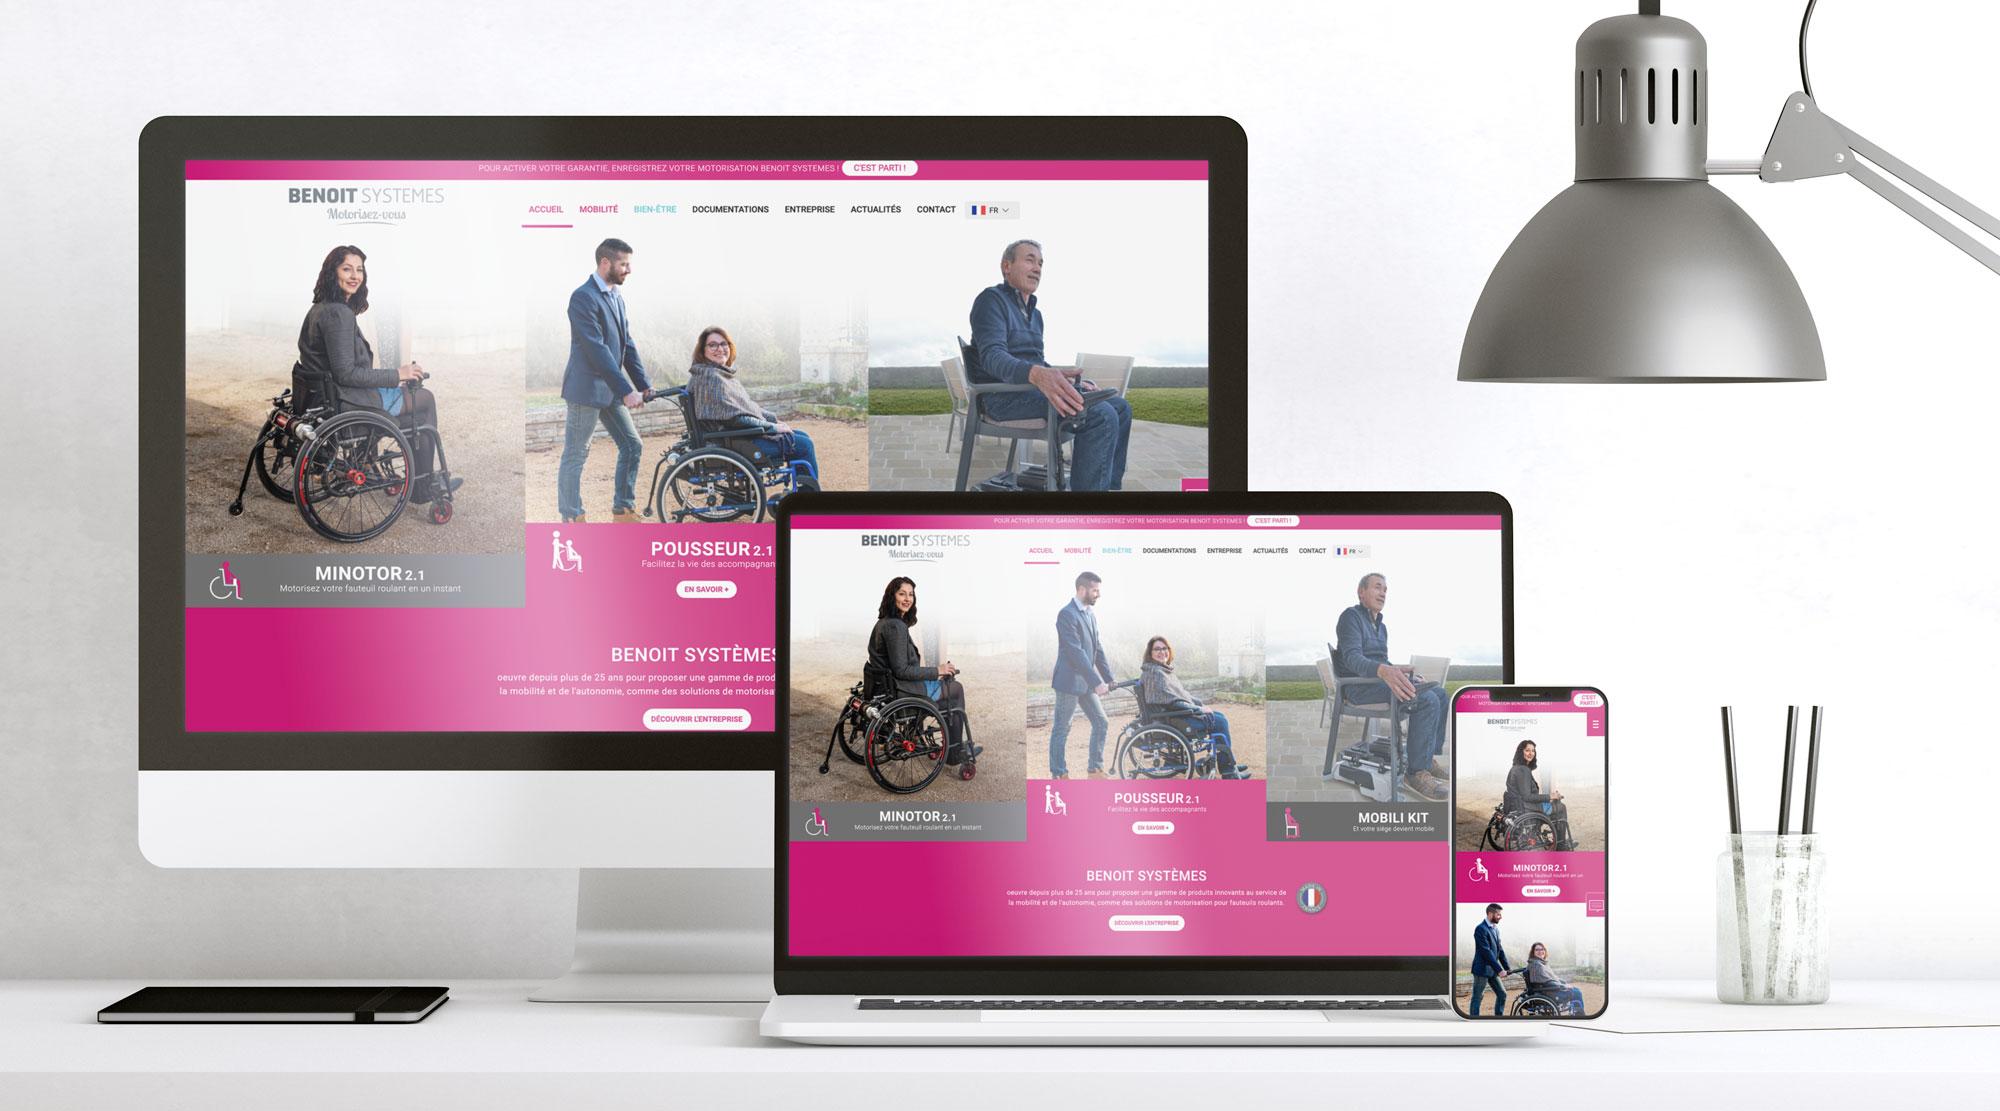 eclolink-agence-web-marketing-dijon-reference-client-benoit-systemes-mockup-responsive